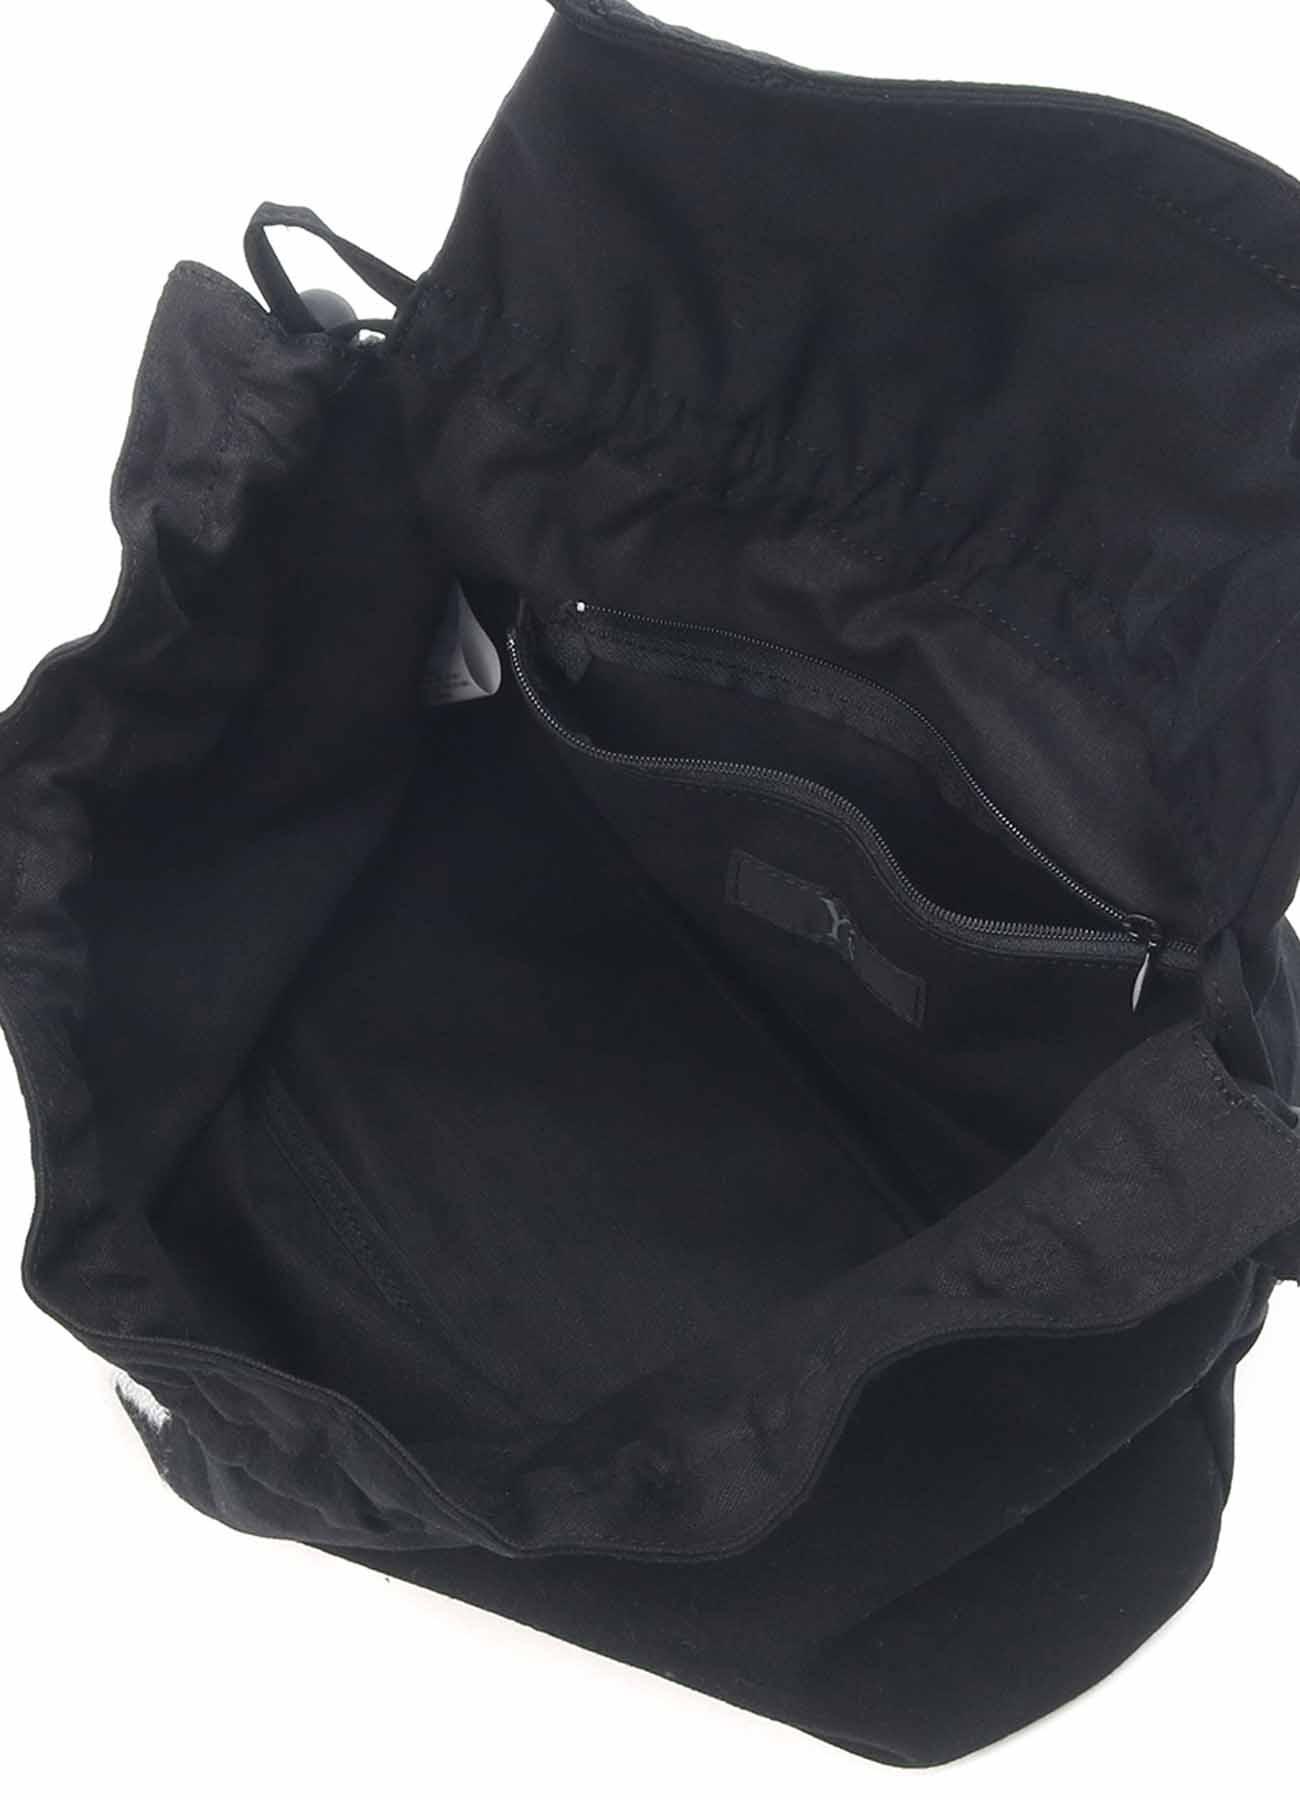 GABARDINE NEEDLE PUNCH Y's PURSE STYLE BAG